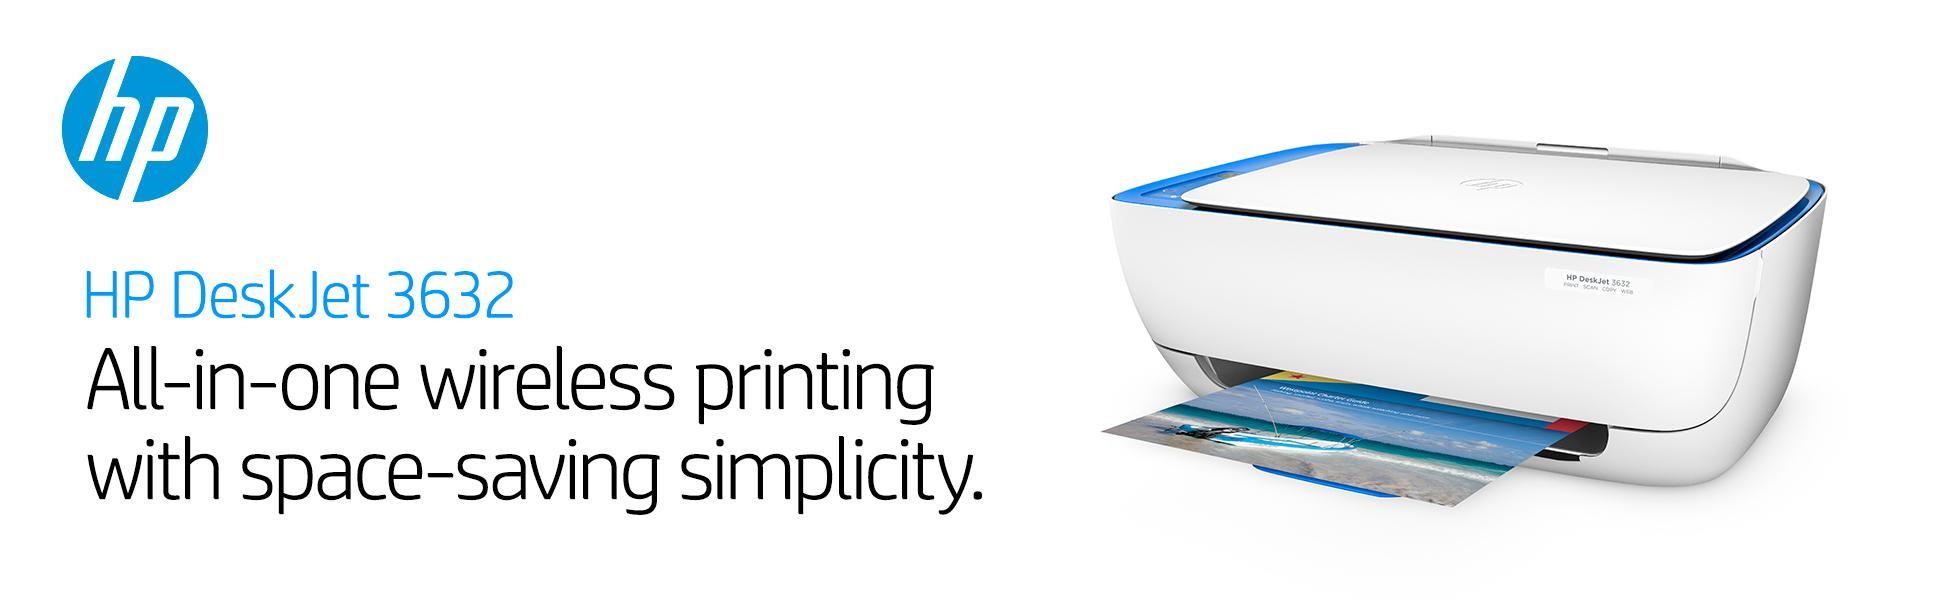 Admirable Hp Deskjet 3632 All In One Printer Super Efficient Little Home Interior And Landscaping Palasignezvosmurscom